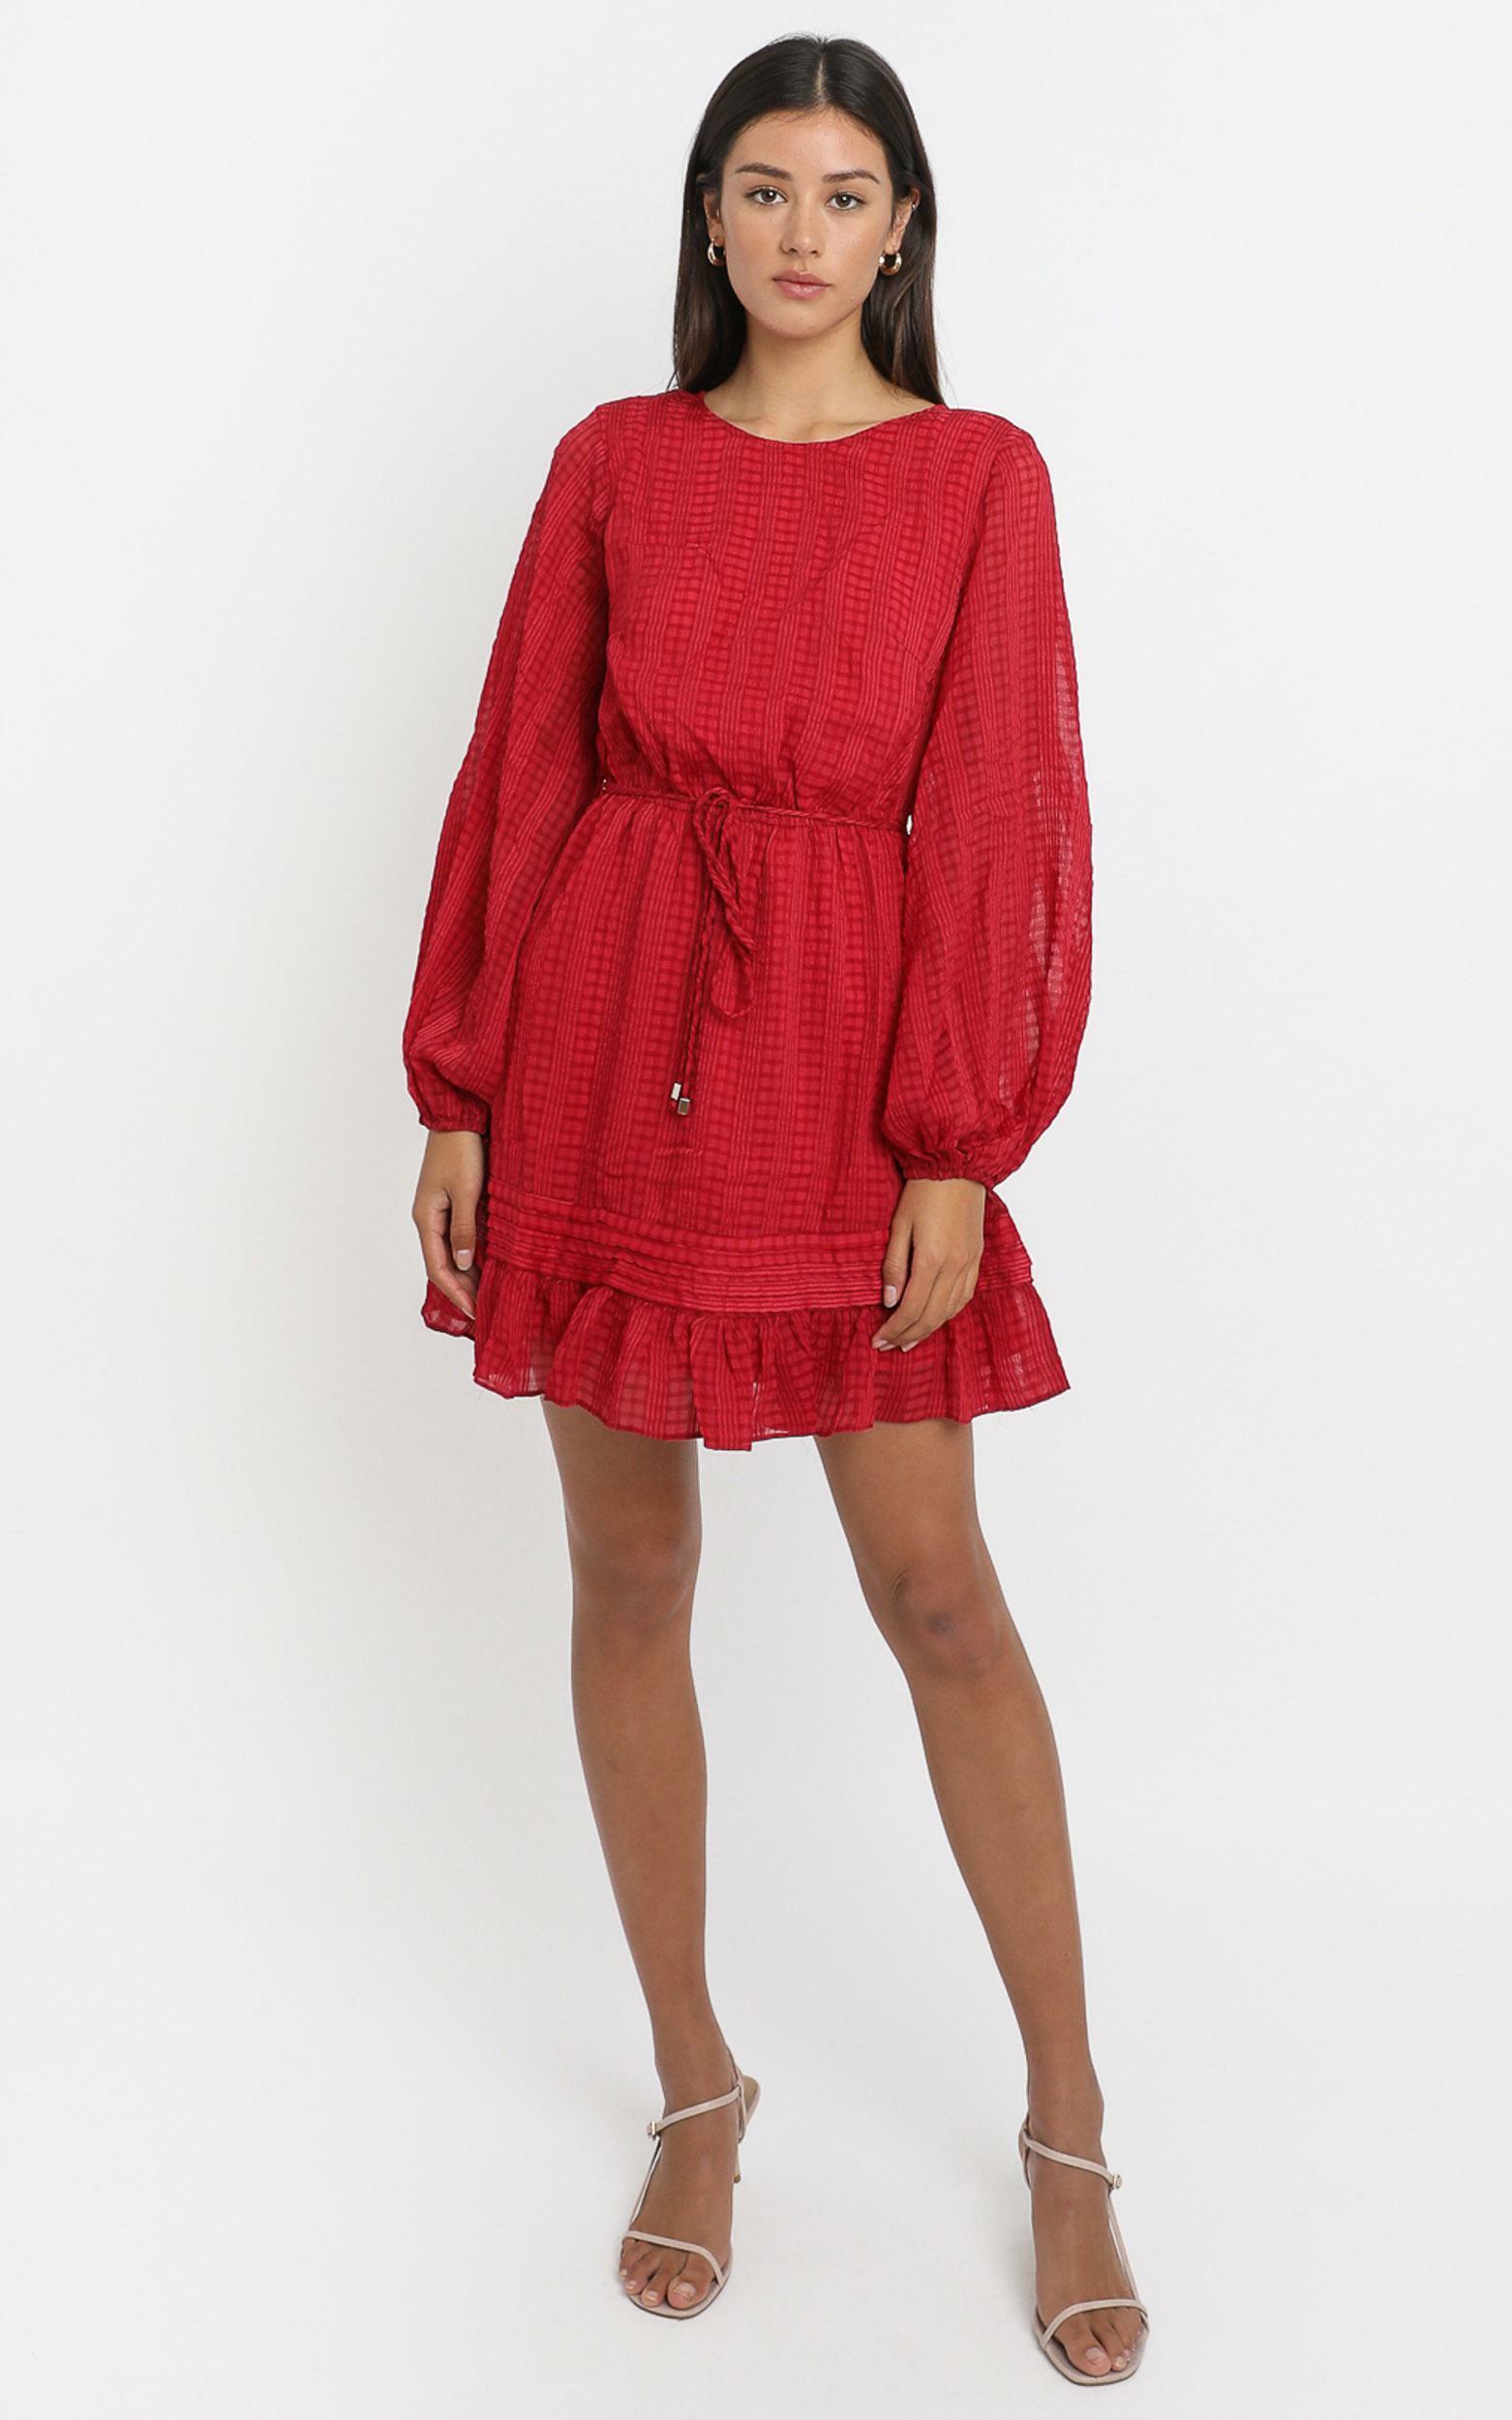 Marlena Dress in Wine - 6 (XS), Wine, hi-res image number null